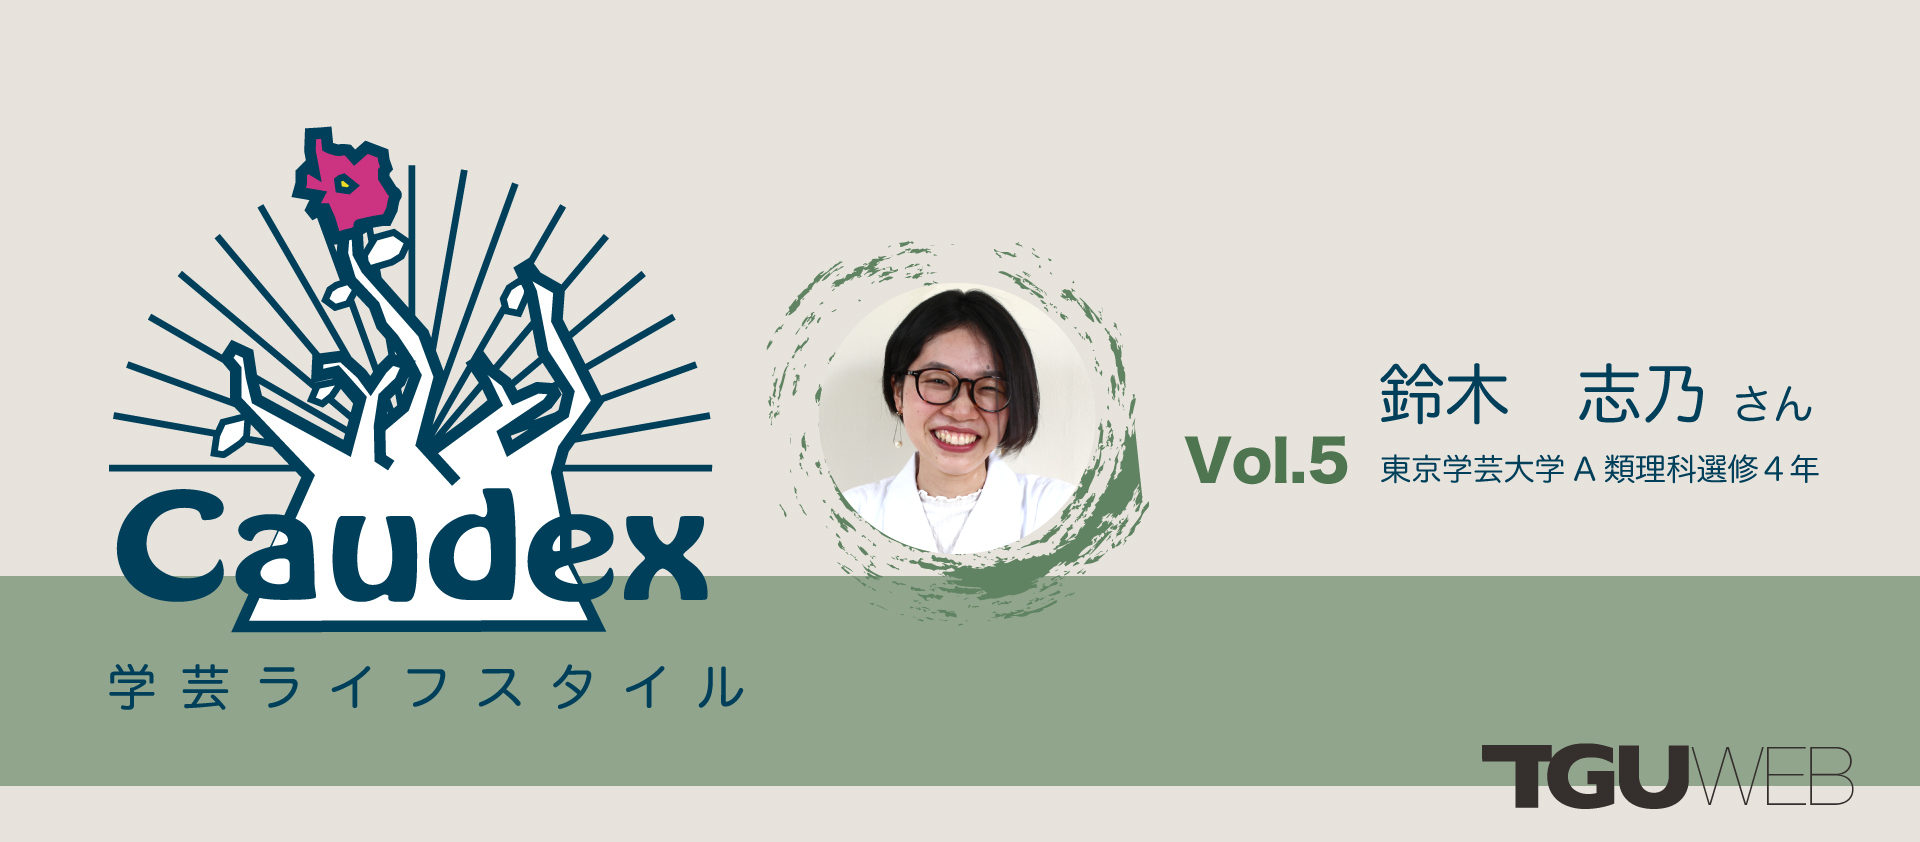 Caudex 学芸ライフスタイル Vol.5  鈴木志乃さん